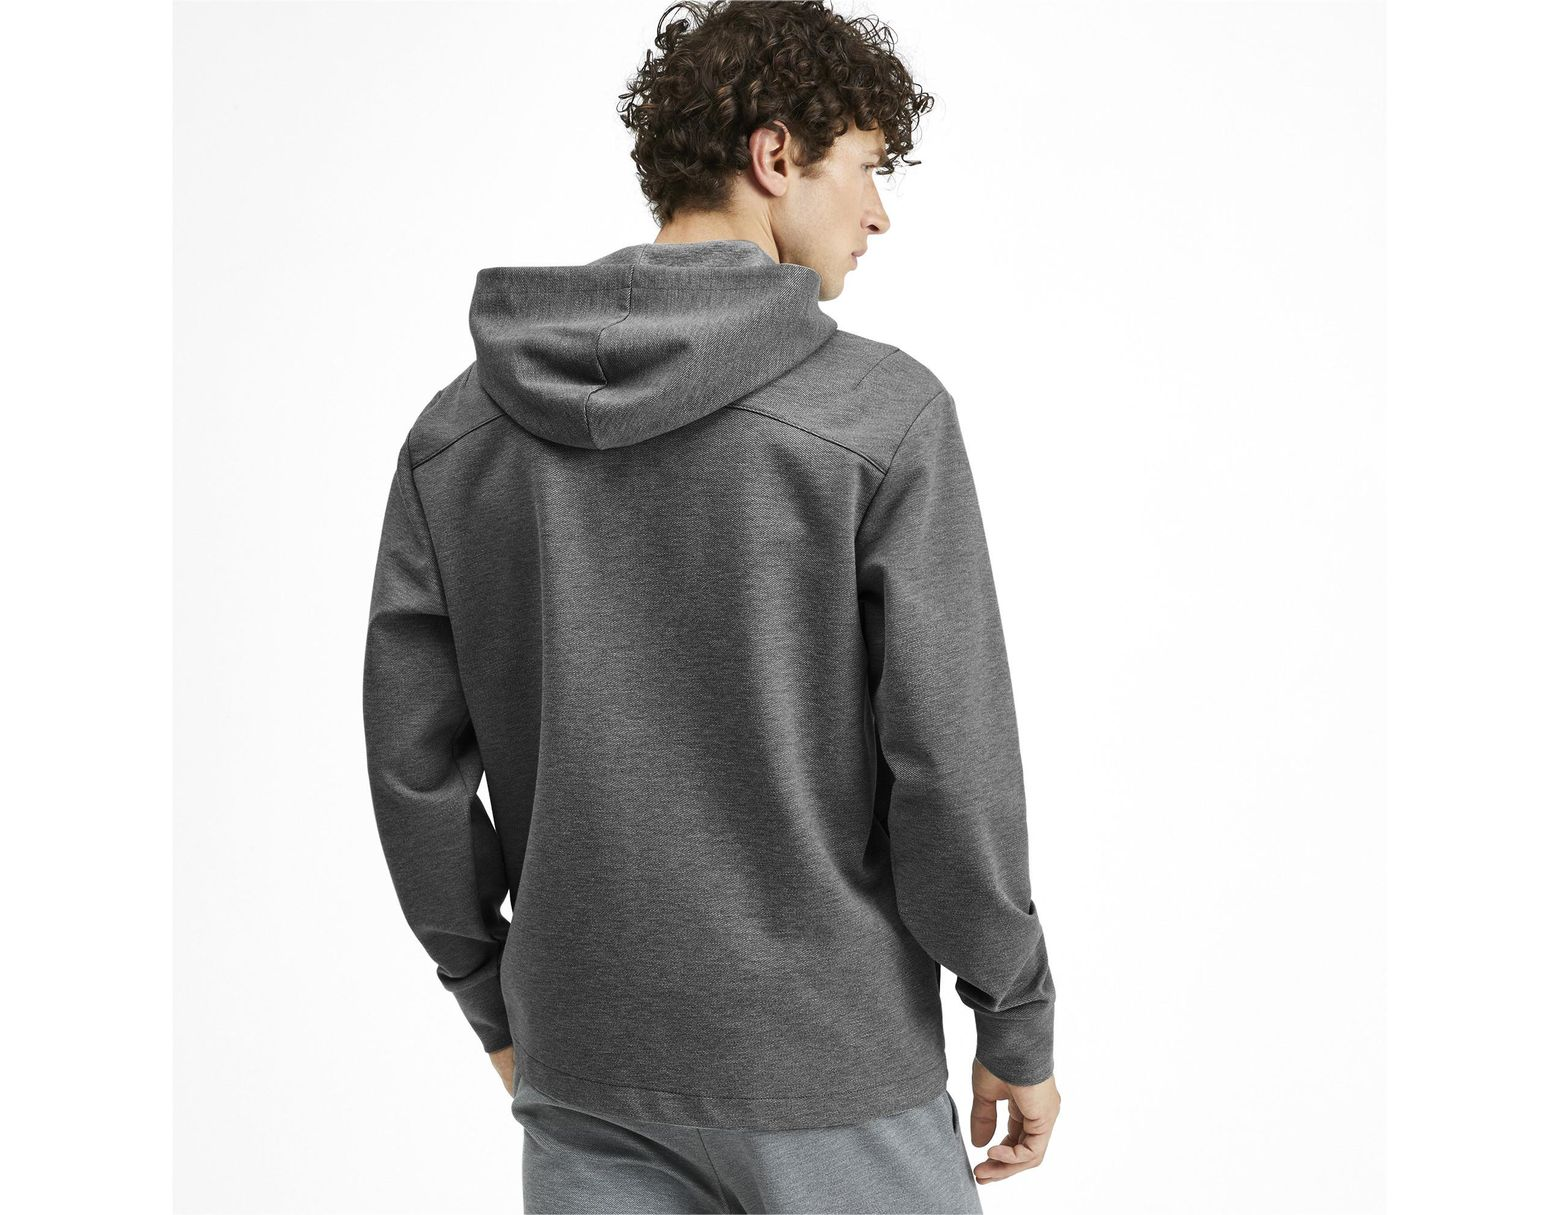 e71094301 PUMA Nu-tility Men's Full Zip Hoodie in Gray for Men - Lyst